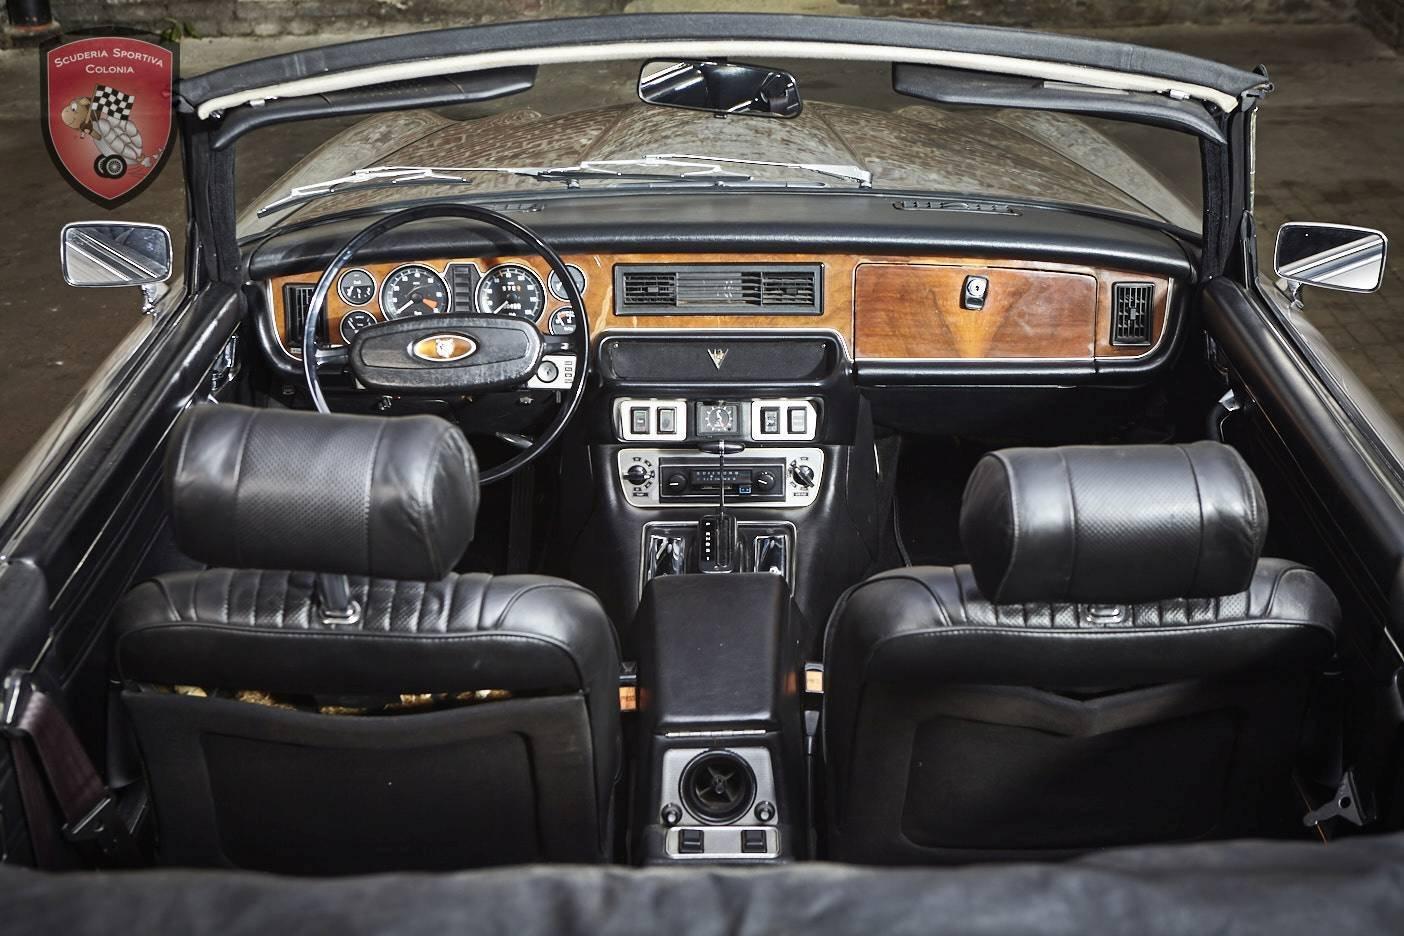 1974 Jaguar XJC 5.3 convertible For Sale (picture 4 of 6)